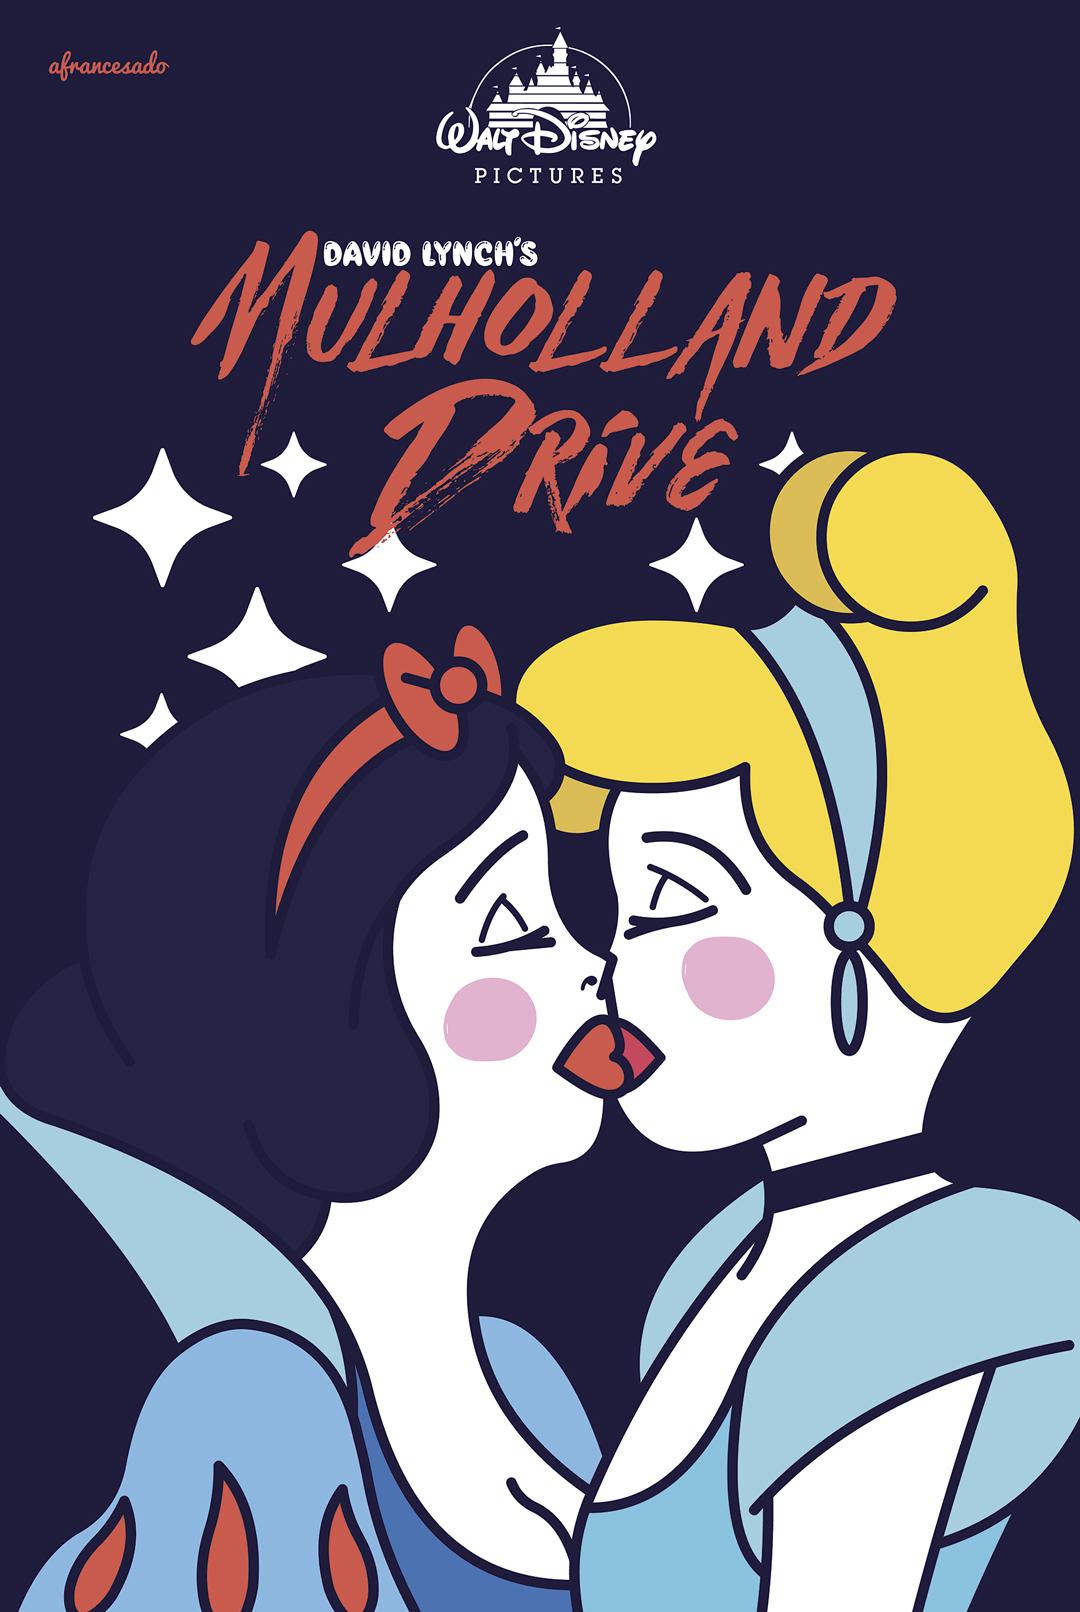 afrancesado Mulholland Drive